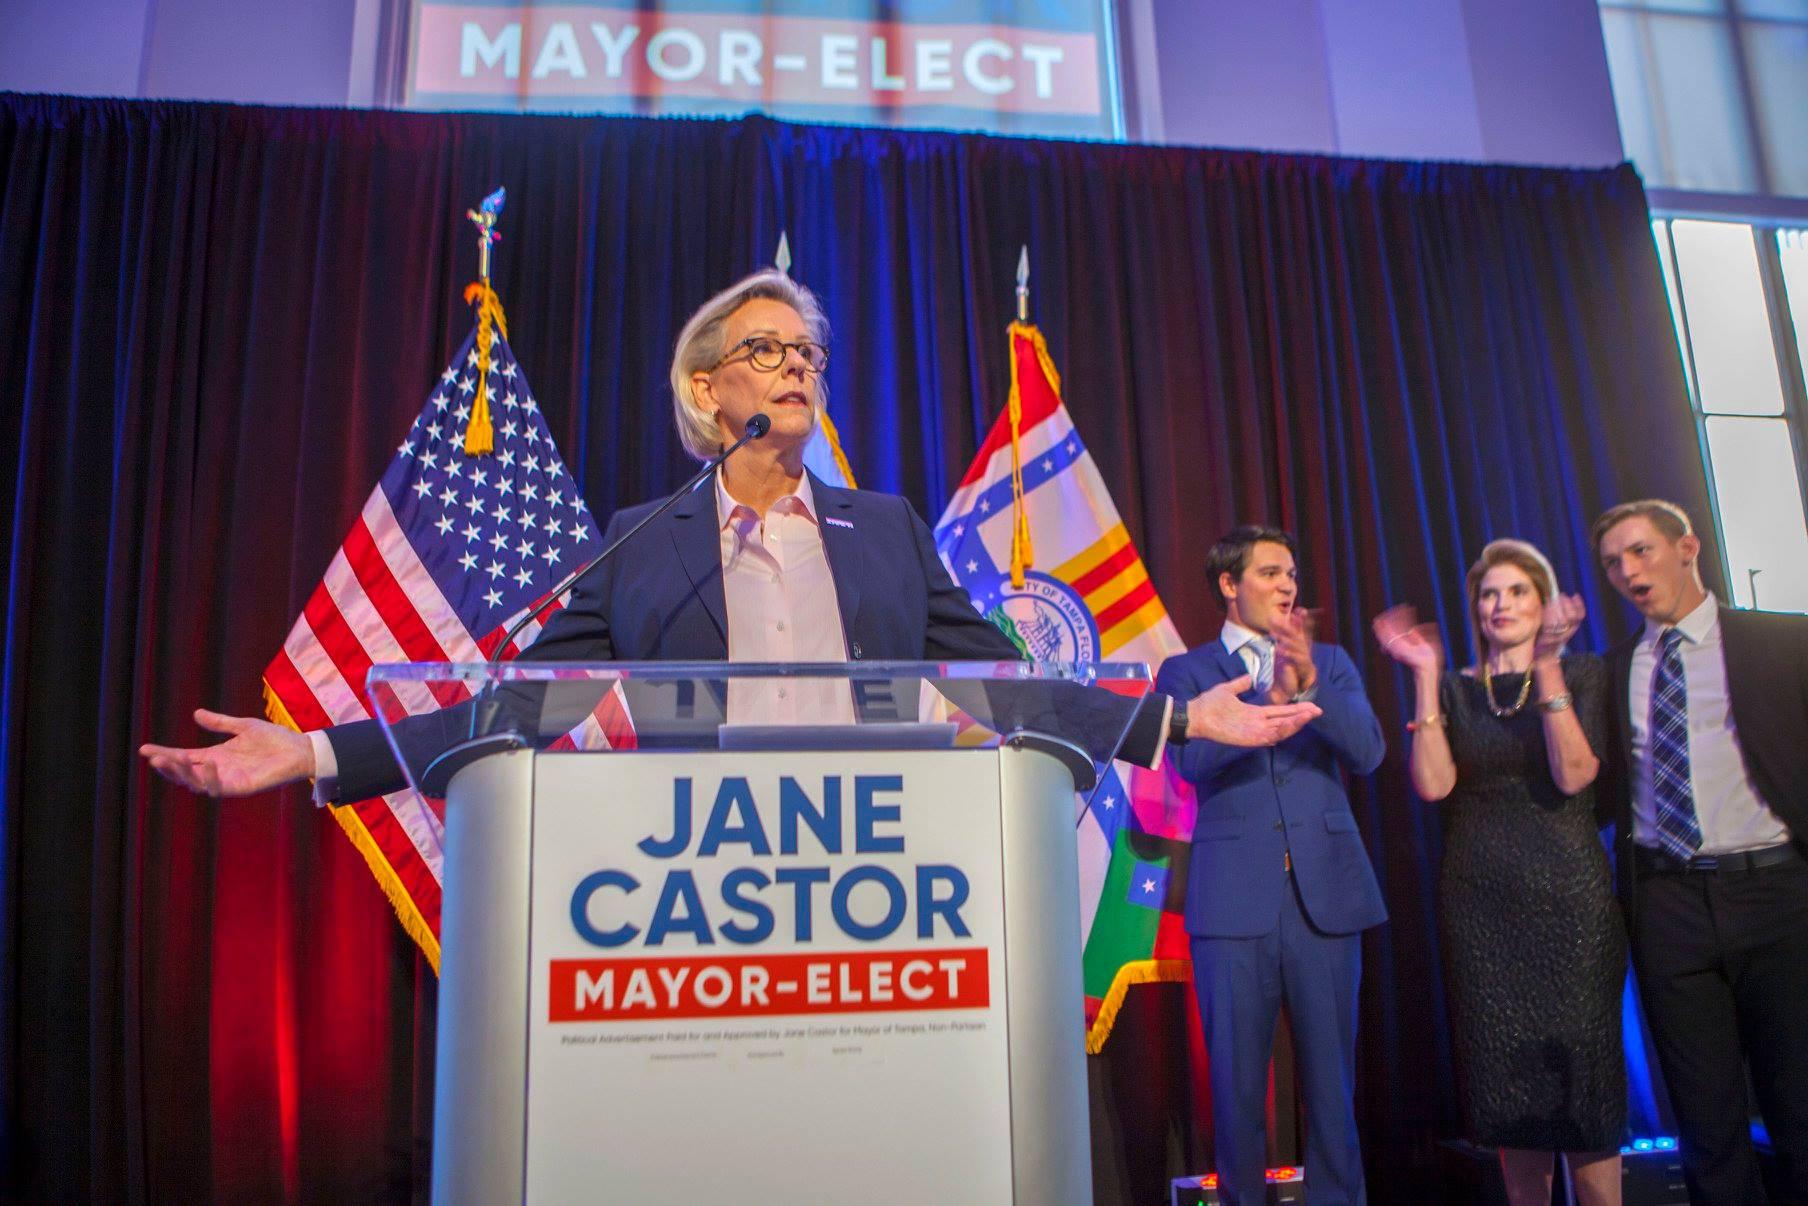 jane-castor-elected.jpg